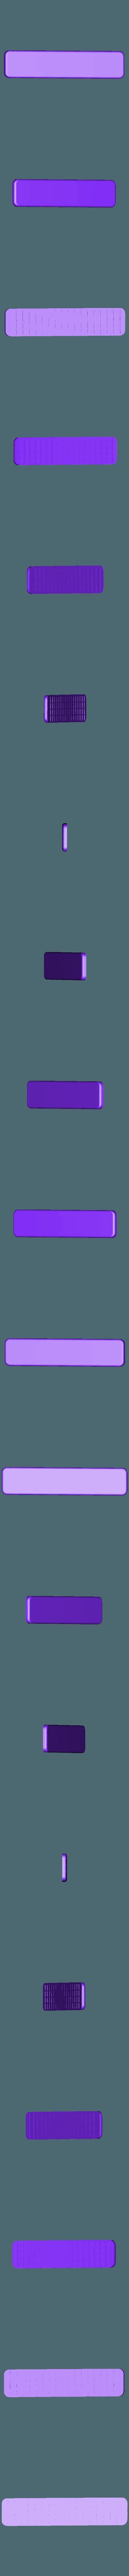 Trasparent_TurnLights_2pc.stl Descargar archivo STL CHEVY VAN G20 RC BODY SCALER AXIAL MST TRX4 RC4WD • Modelo para imprimir en 3D, ilyakapitonov